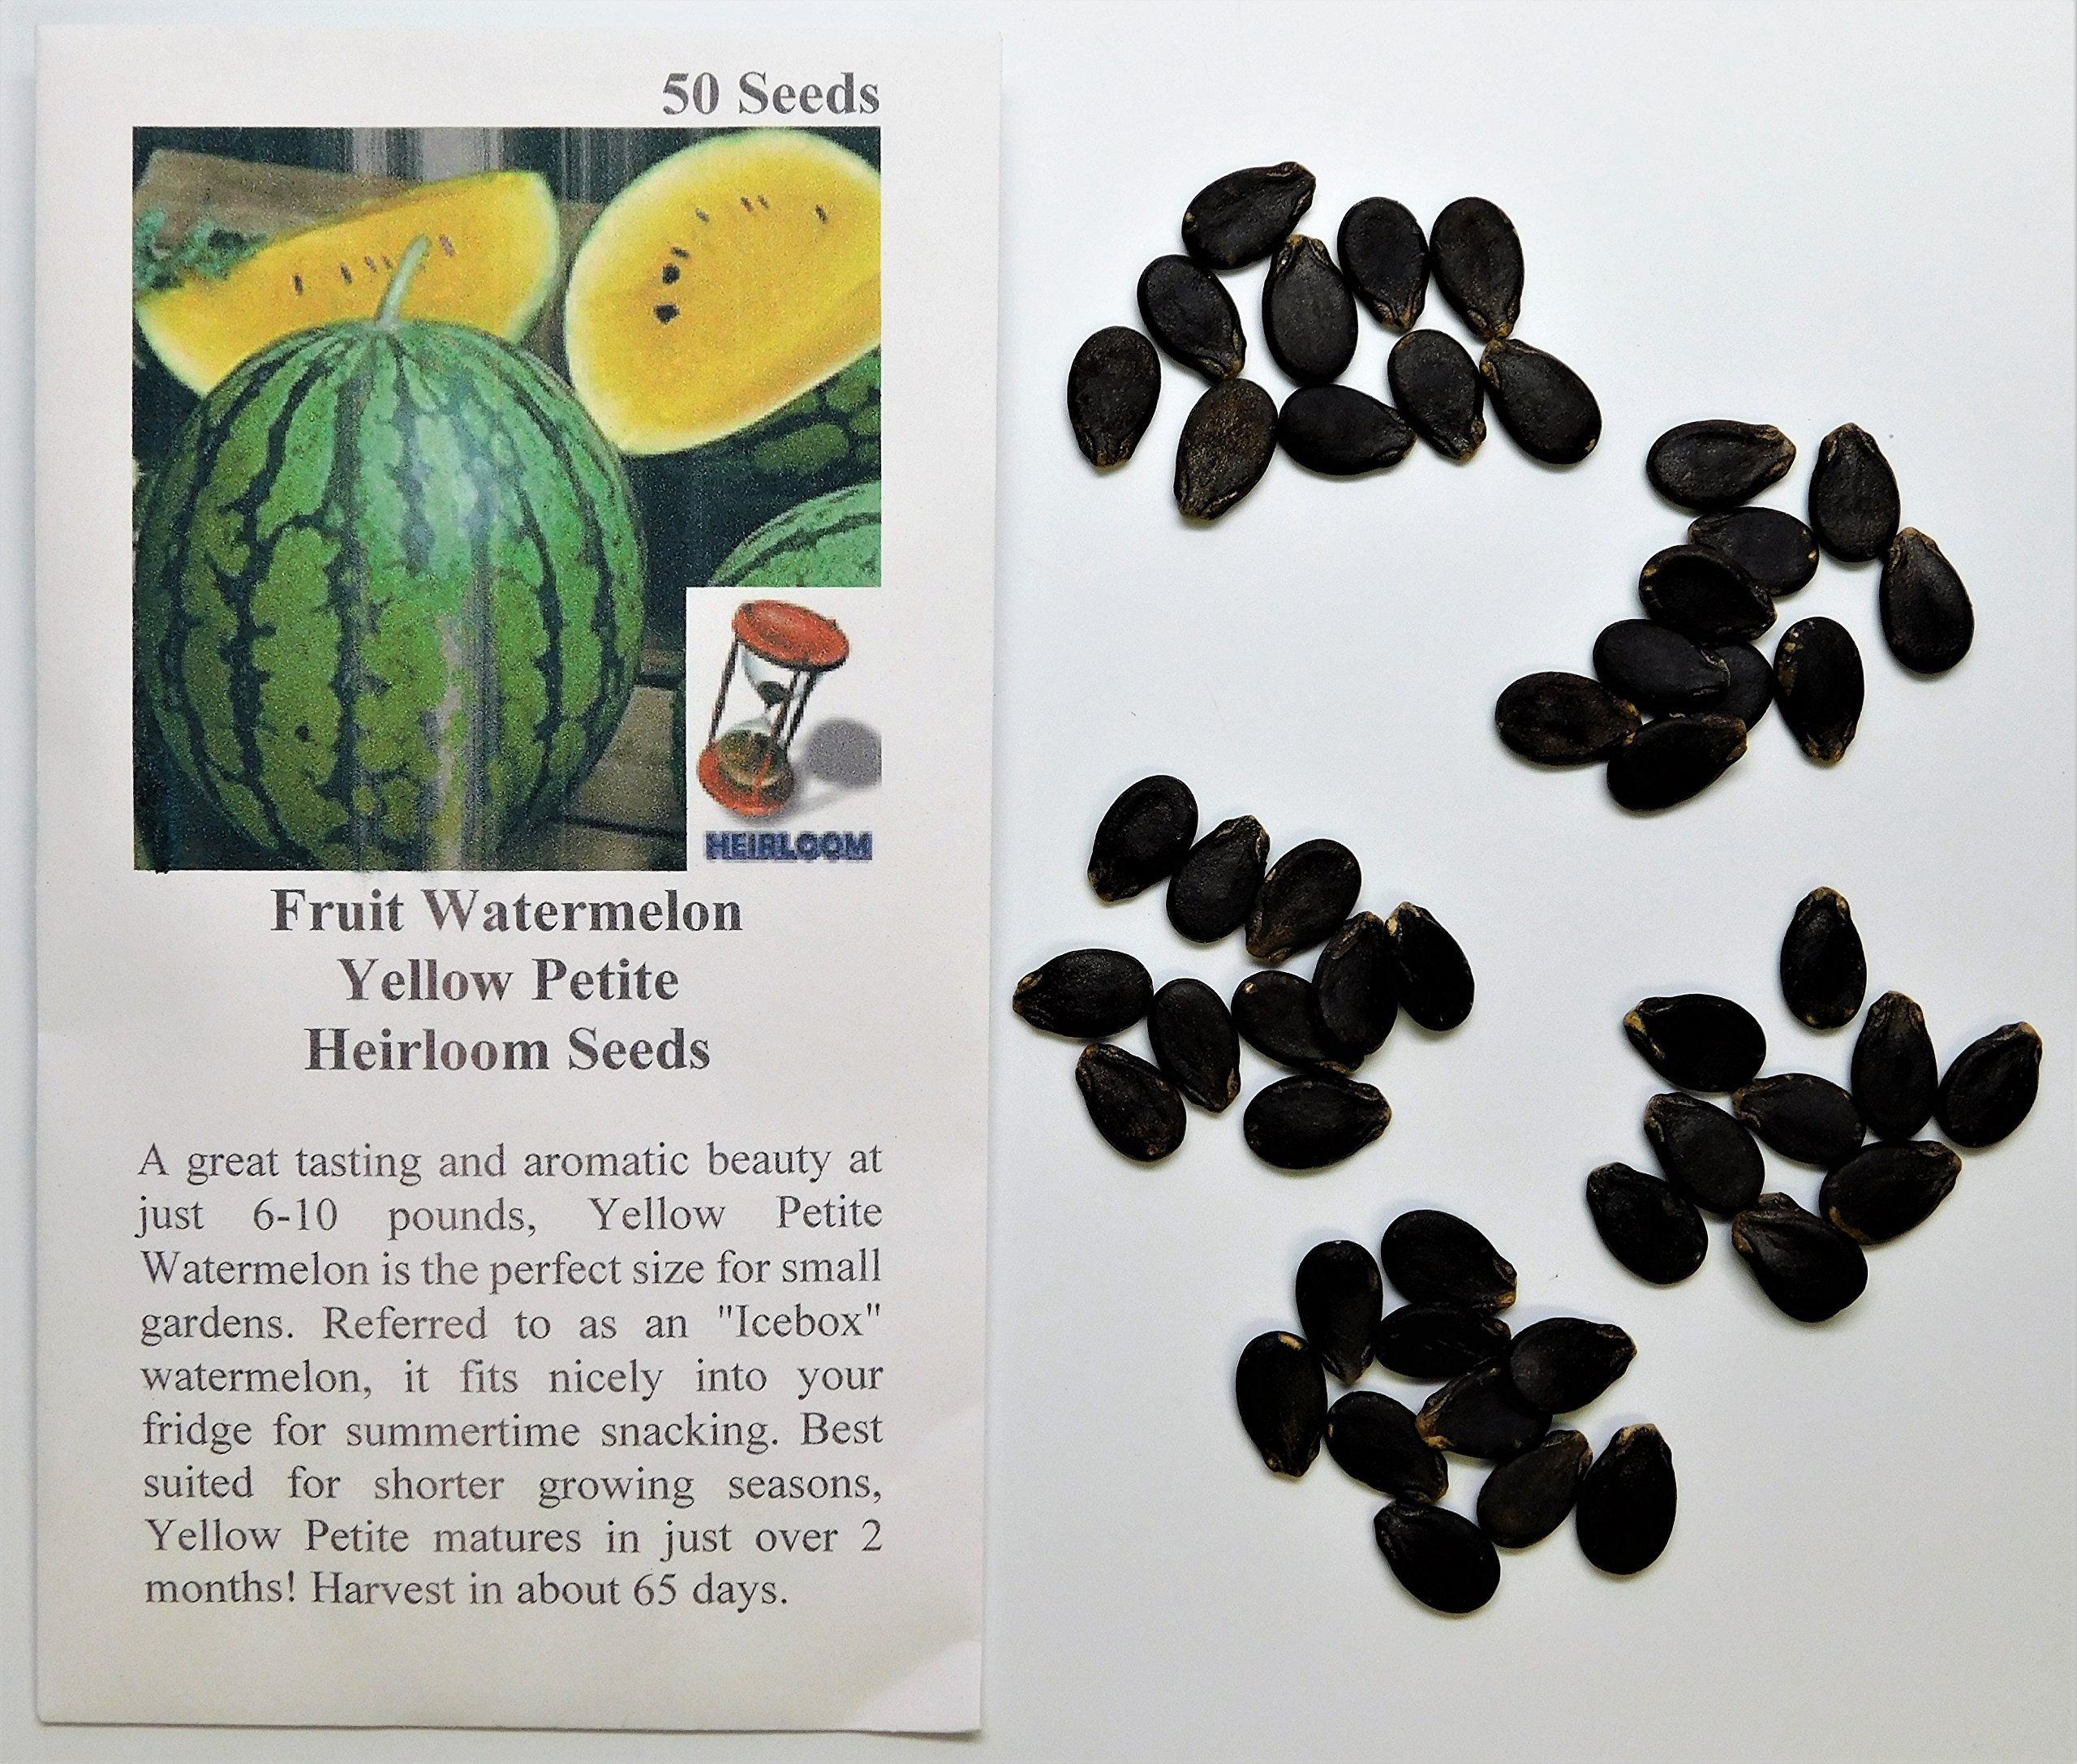 David's Garden Seeds Fruit Watermelon Yellow Petite PZ9812 (Yellow) 50 Heirloom Seeds